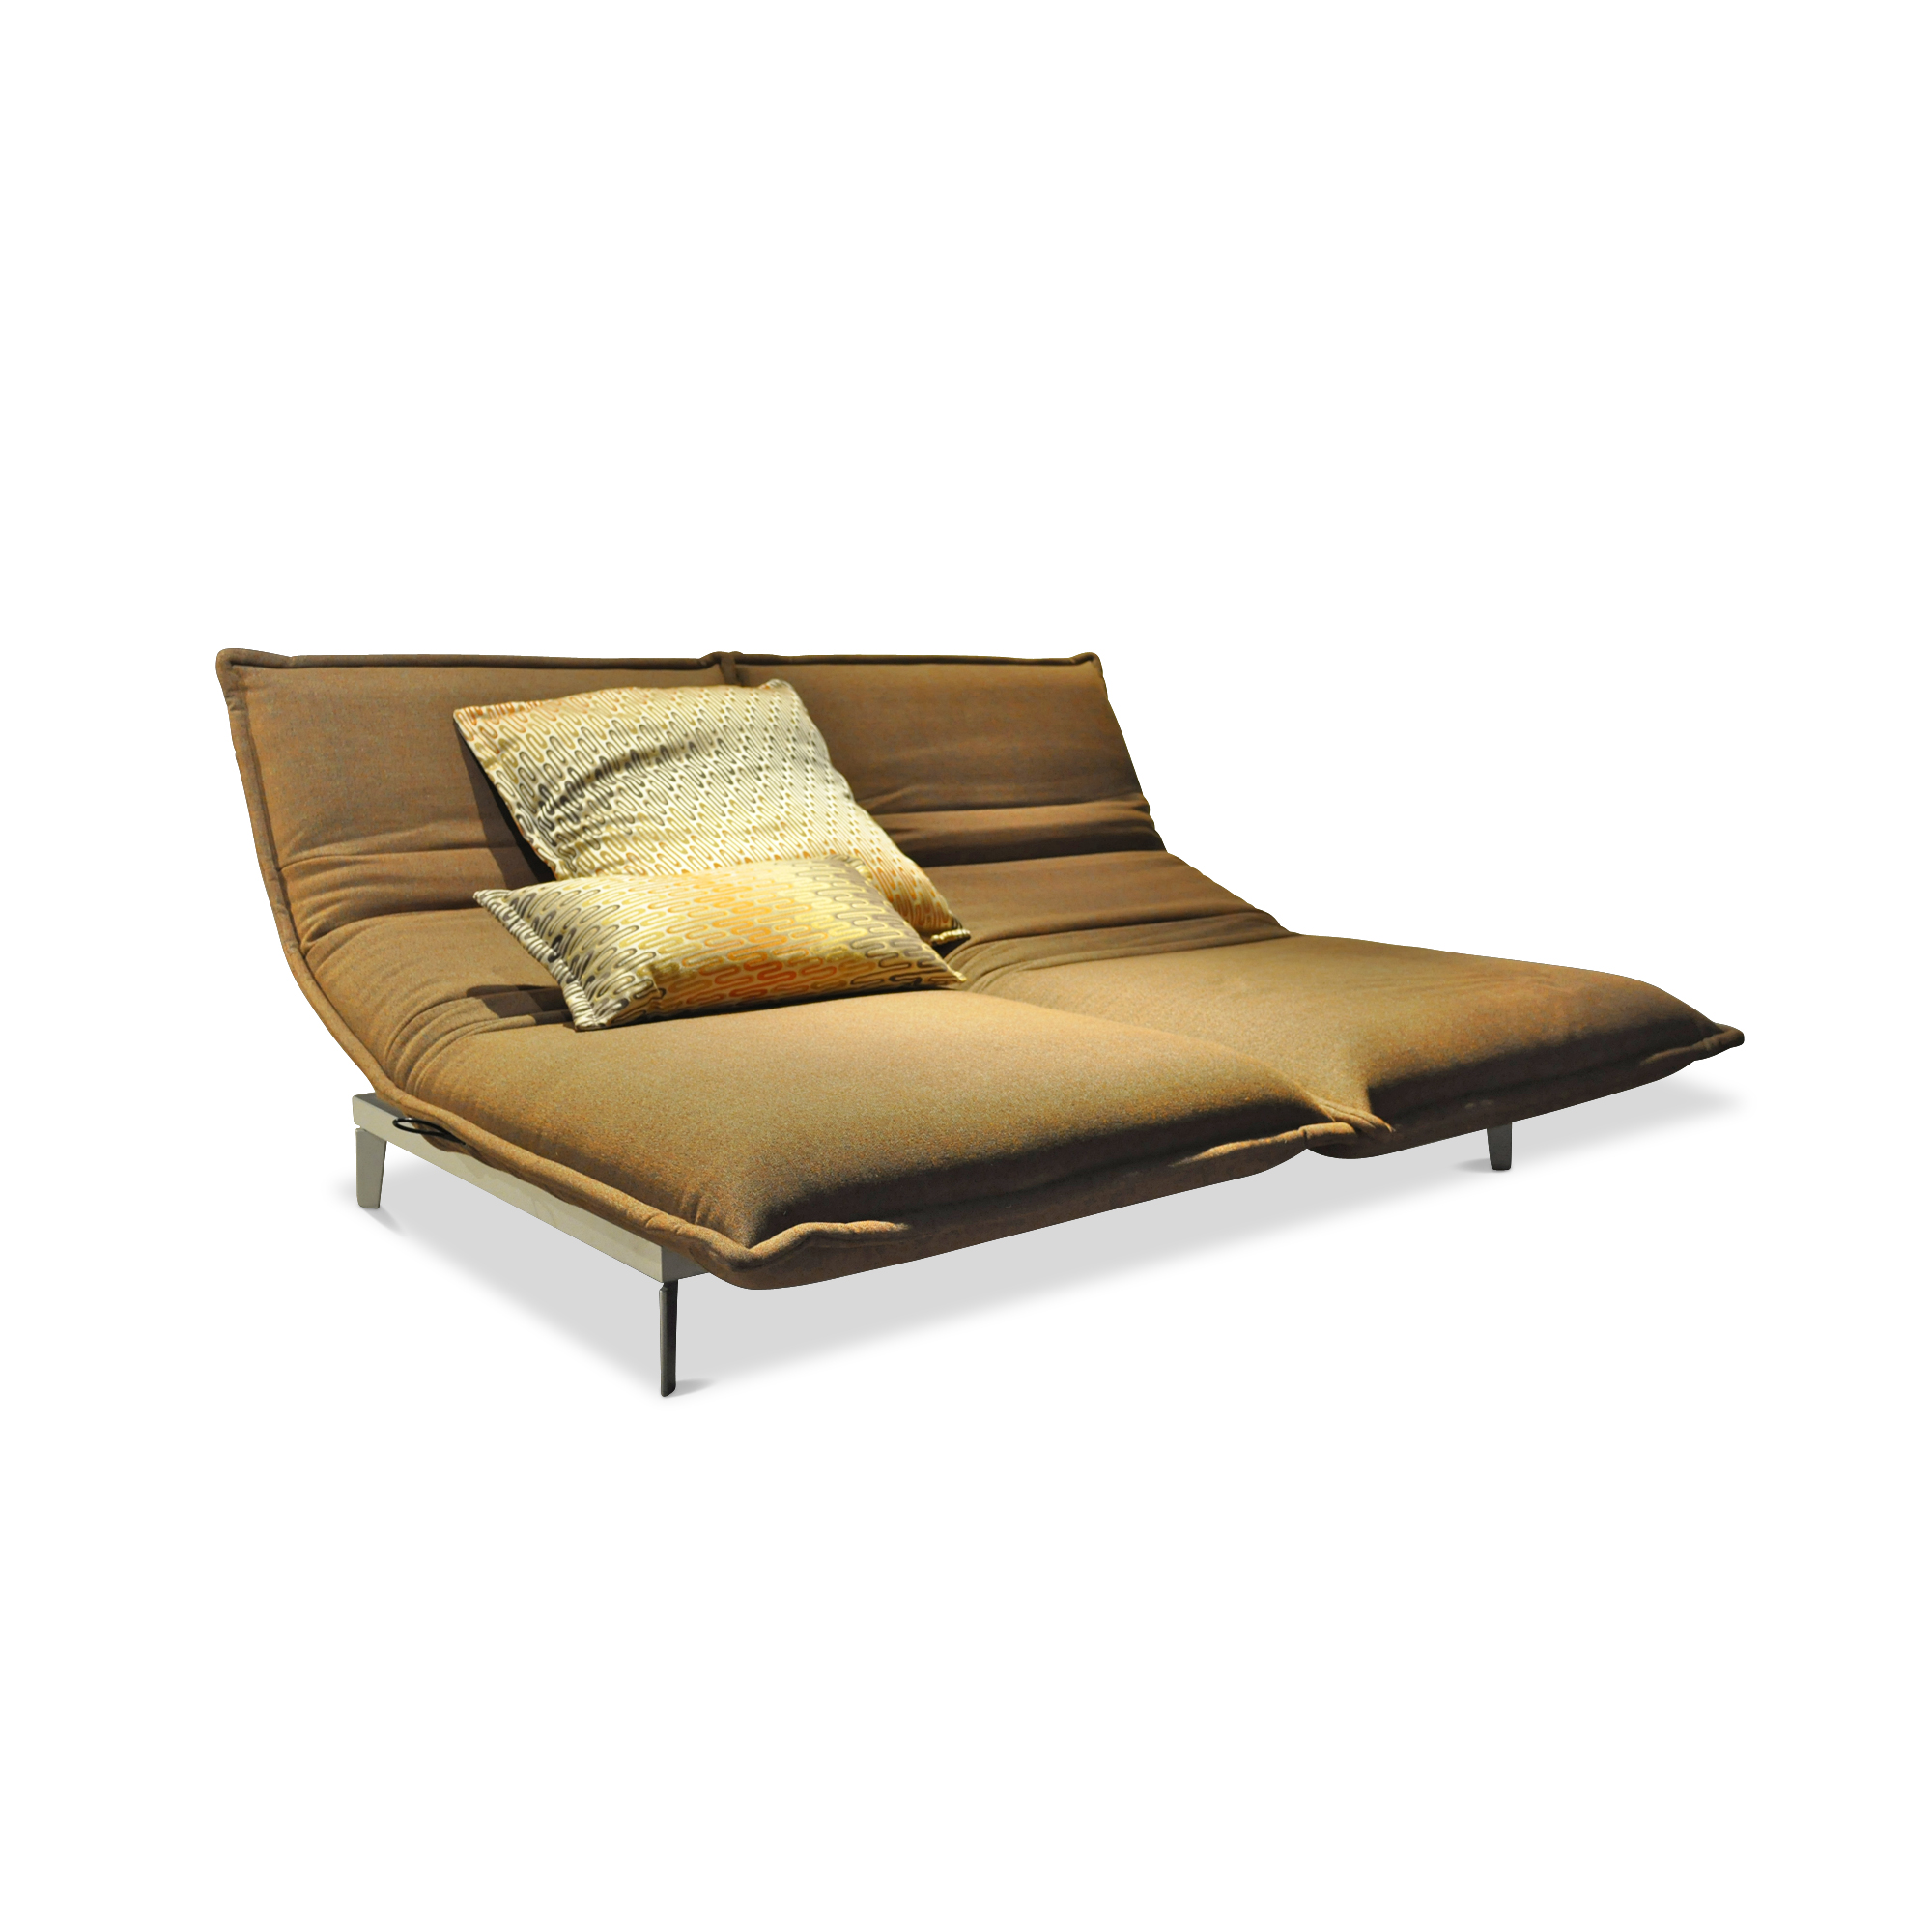 sofa nova beige orange schlaffunktion rolf benz sofas g nstig kaufen m belfirst. Black Bedroom Furniture Sets. Home Design Ideas